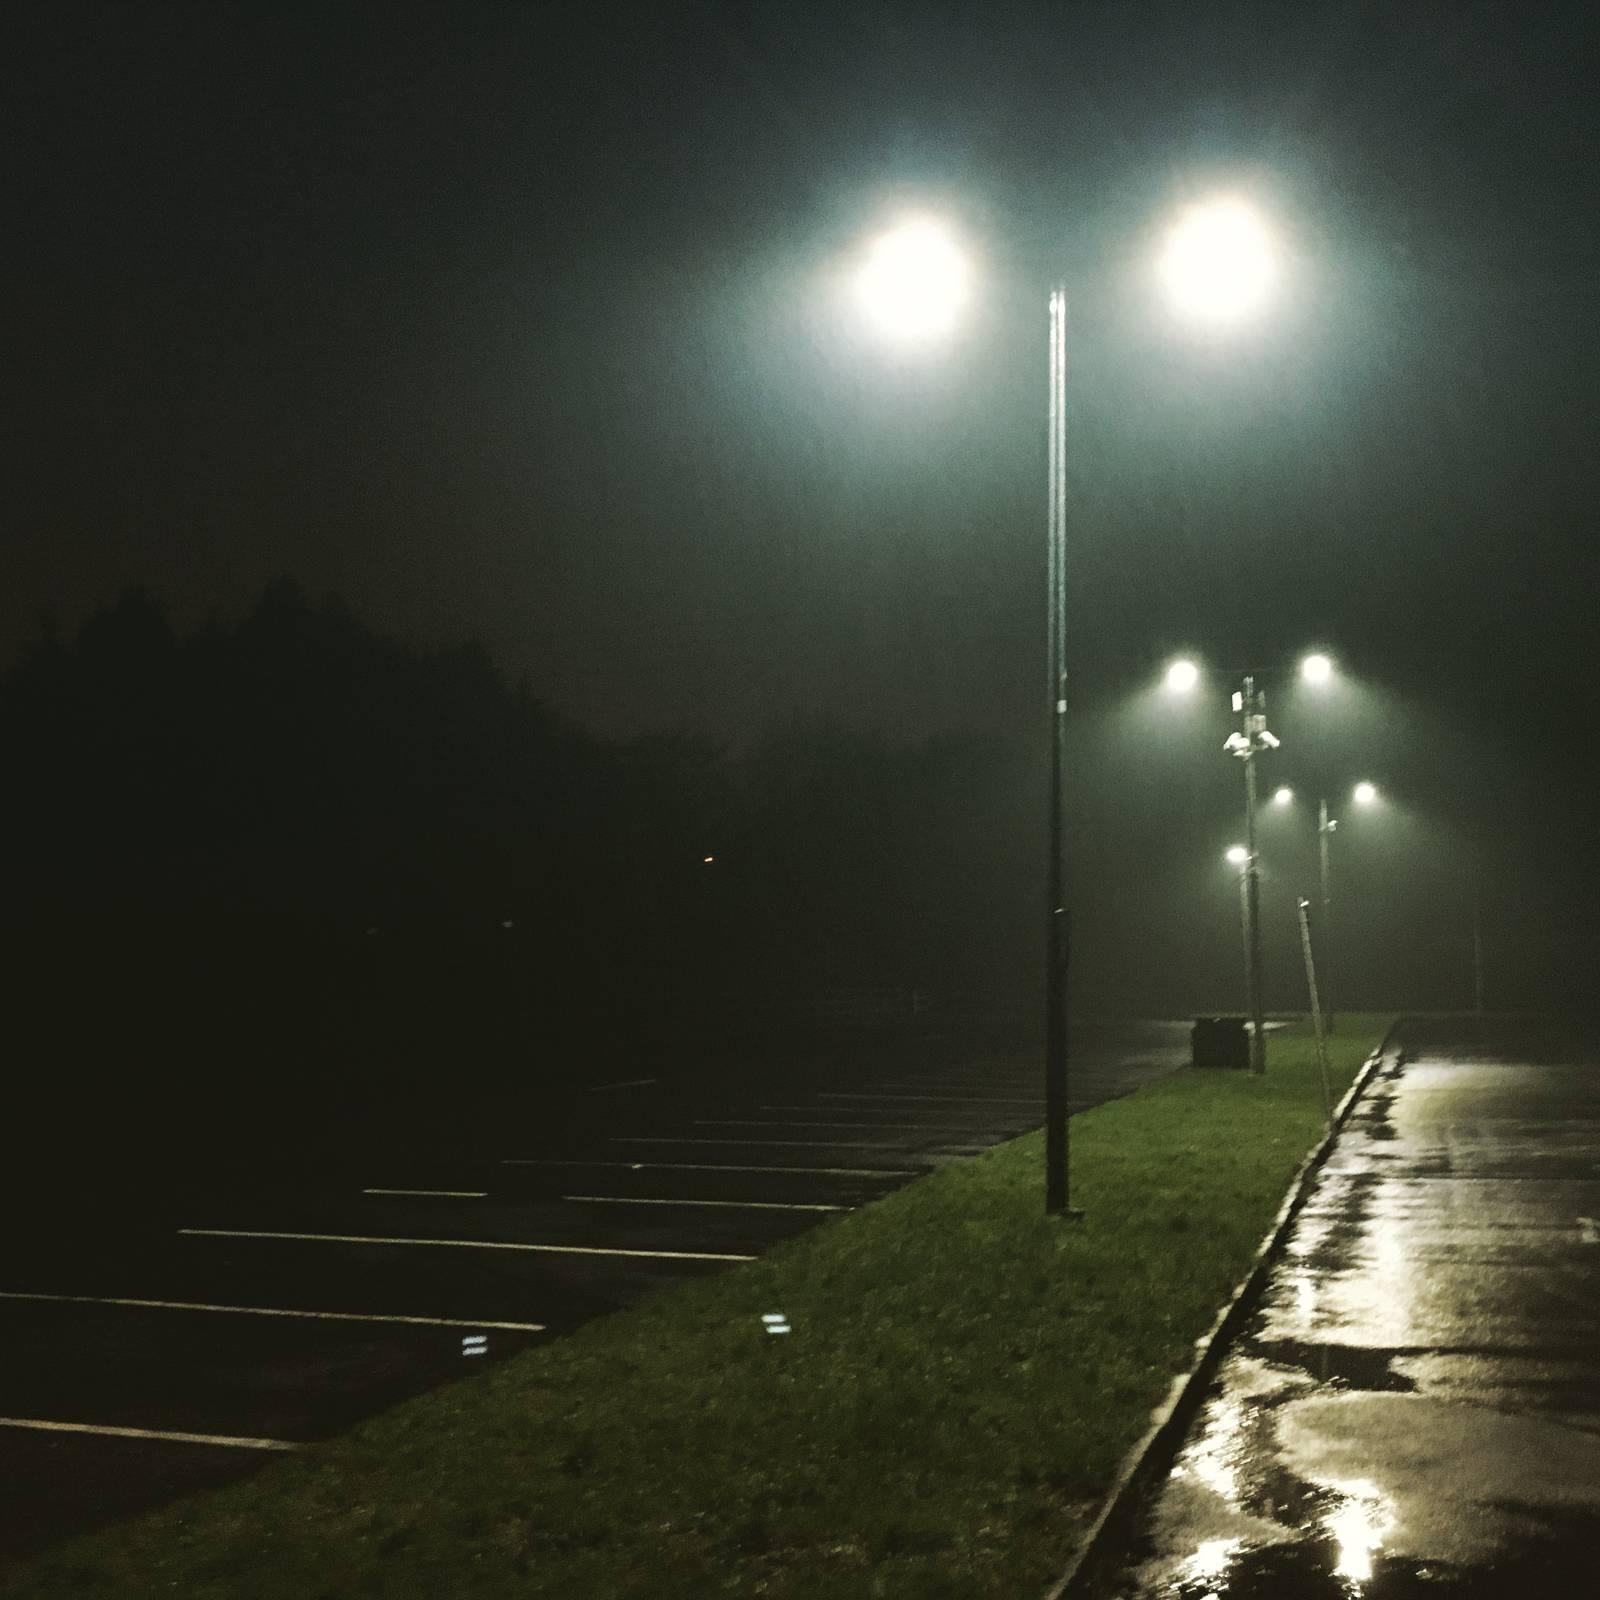 Misty night at Dangan